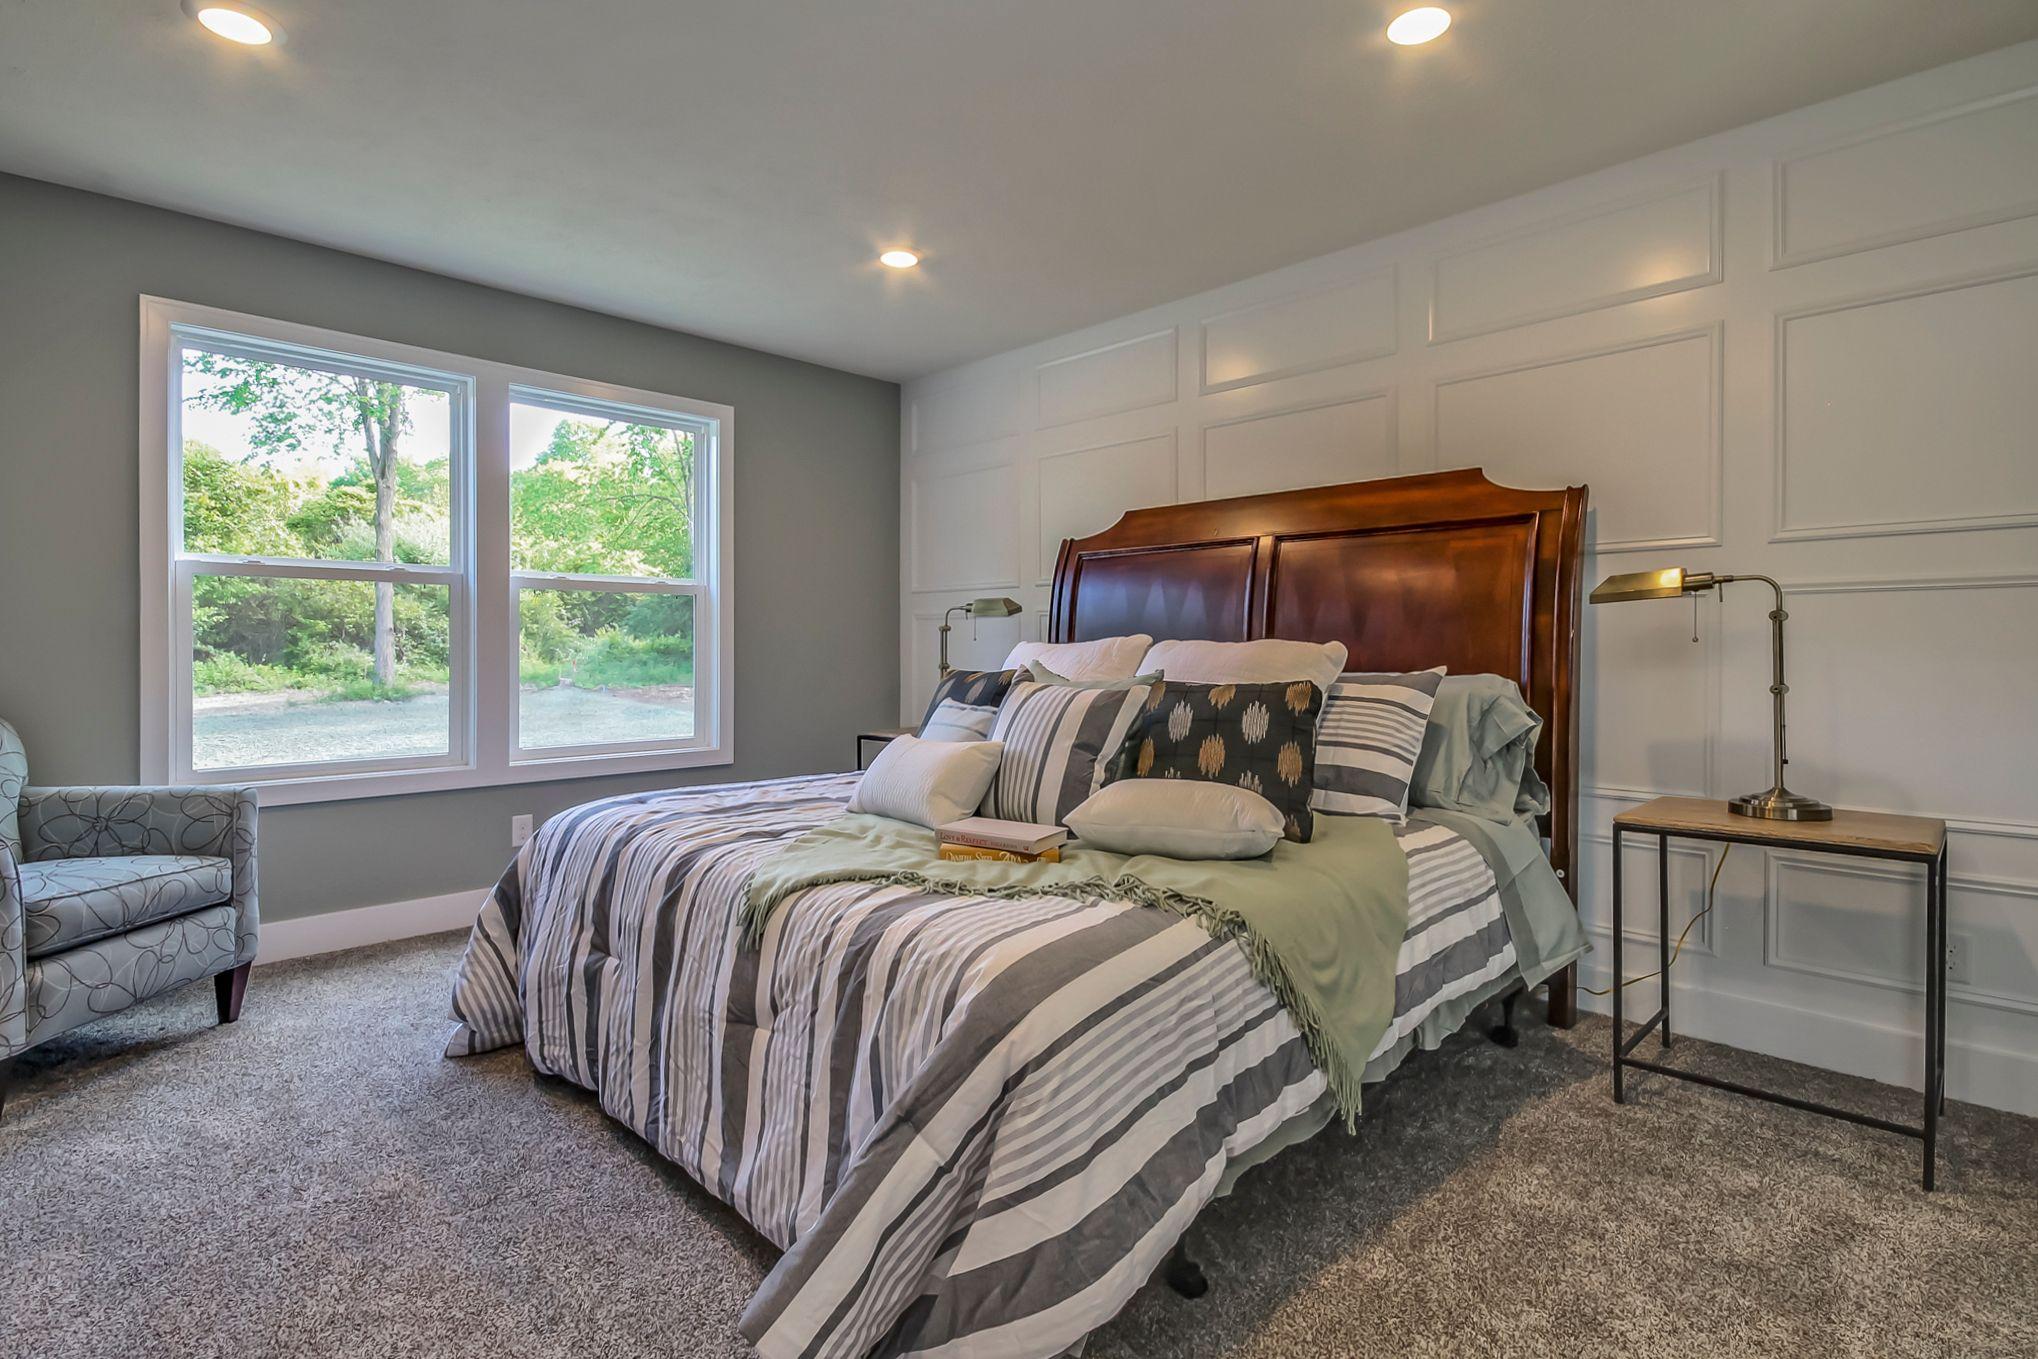 Bedroom featured in The Hadley By Eastbrook Homes Inc. in Lansing, MI